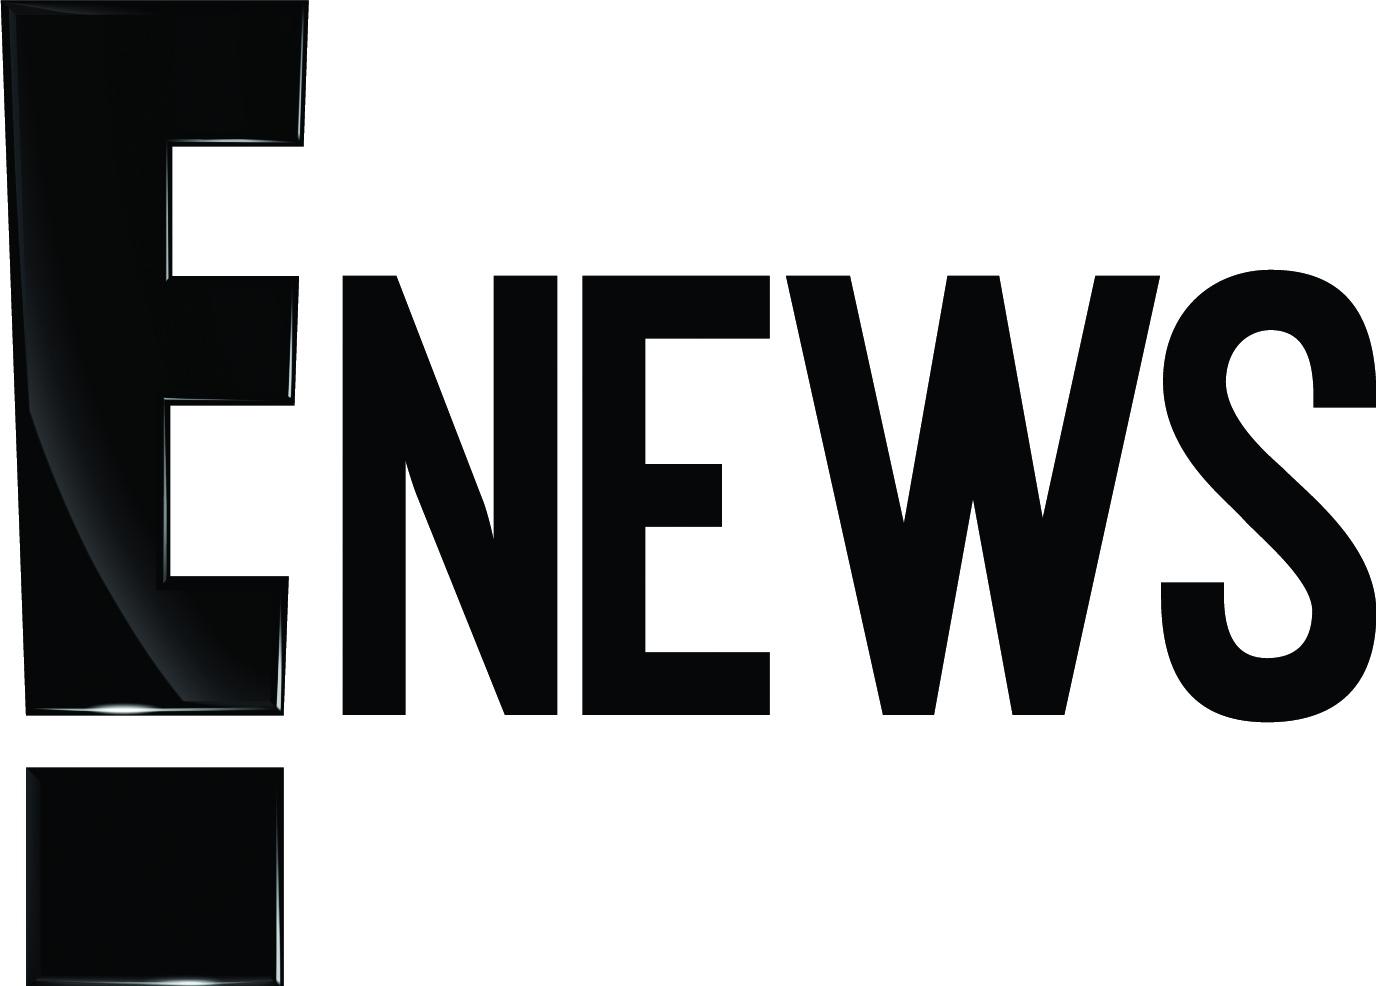 E!_News_current_logo.jpg